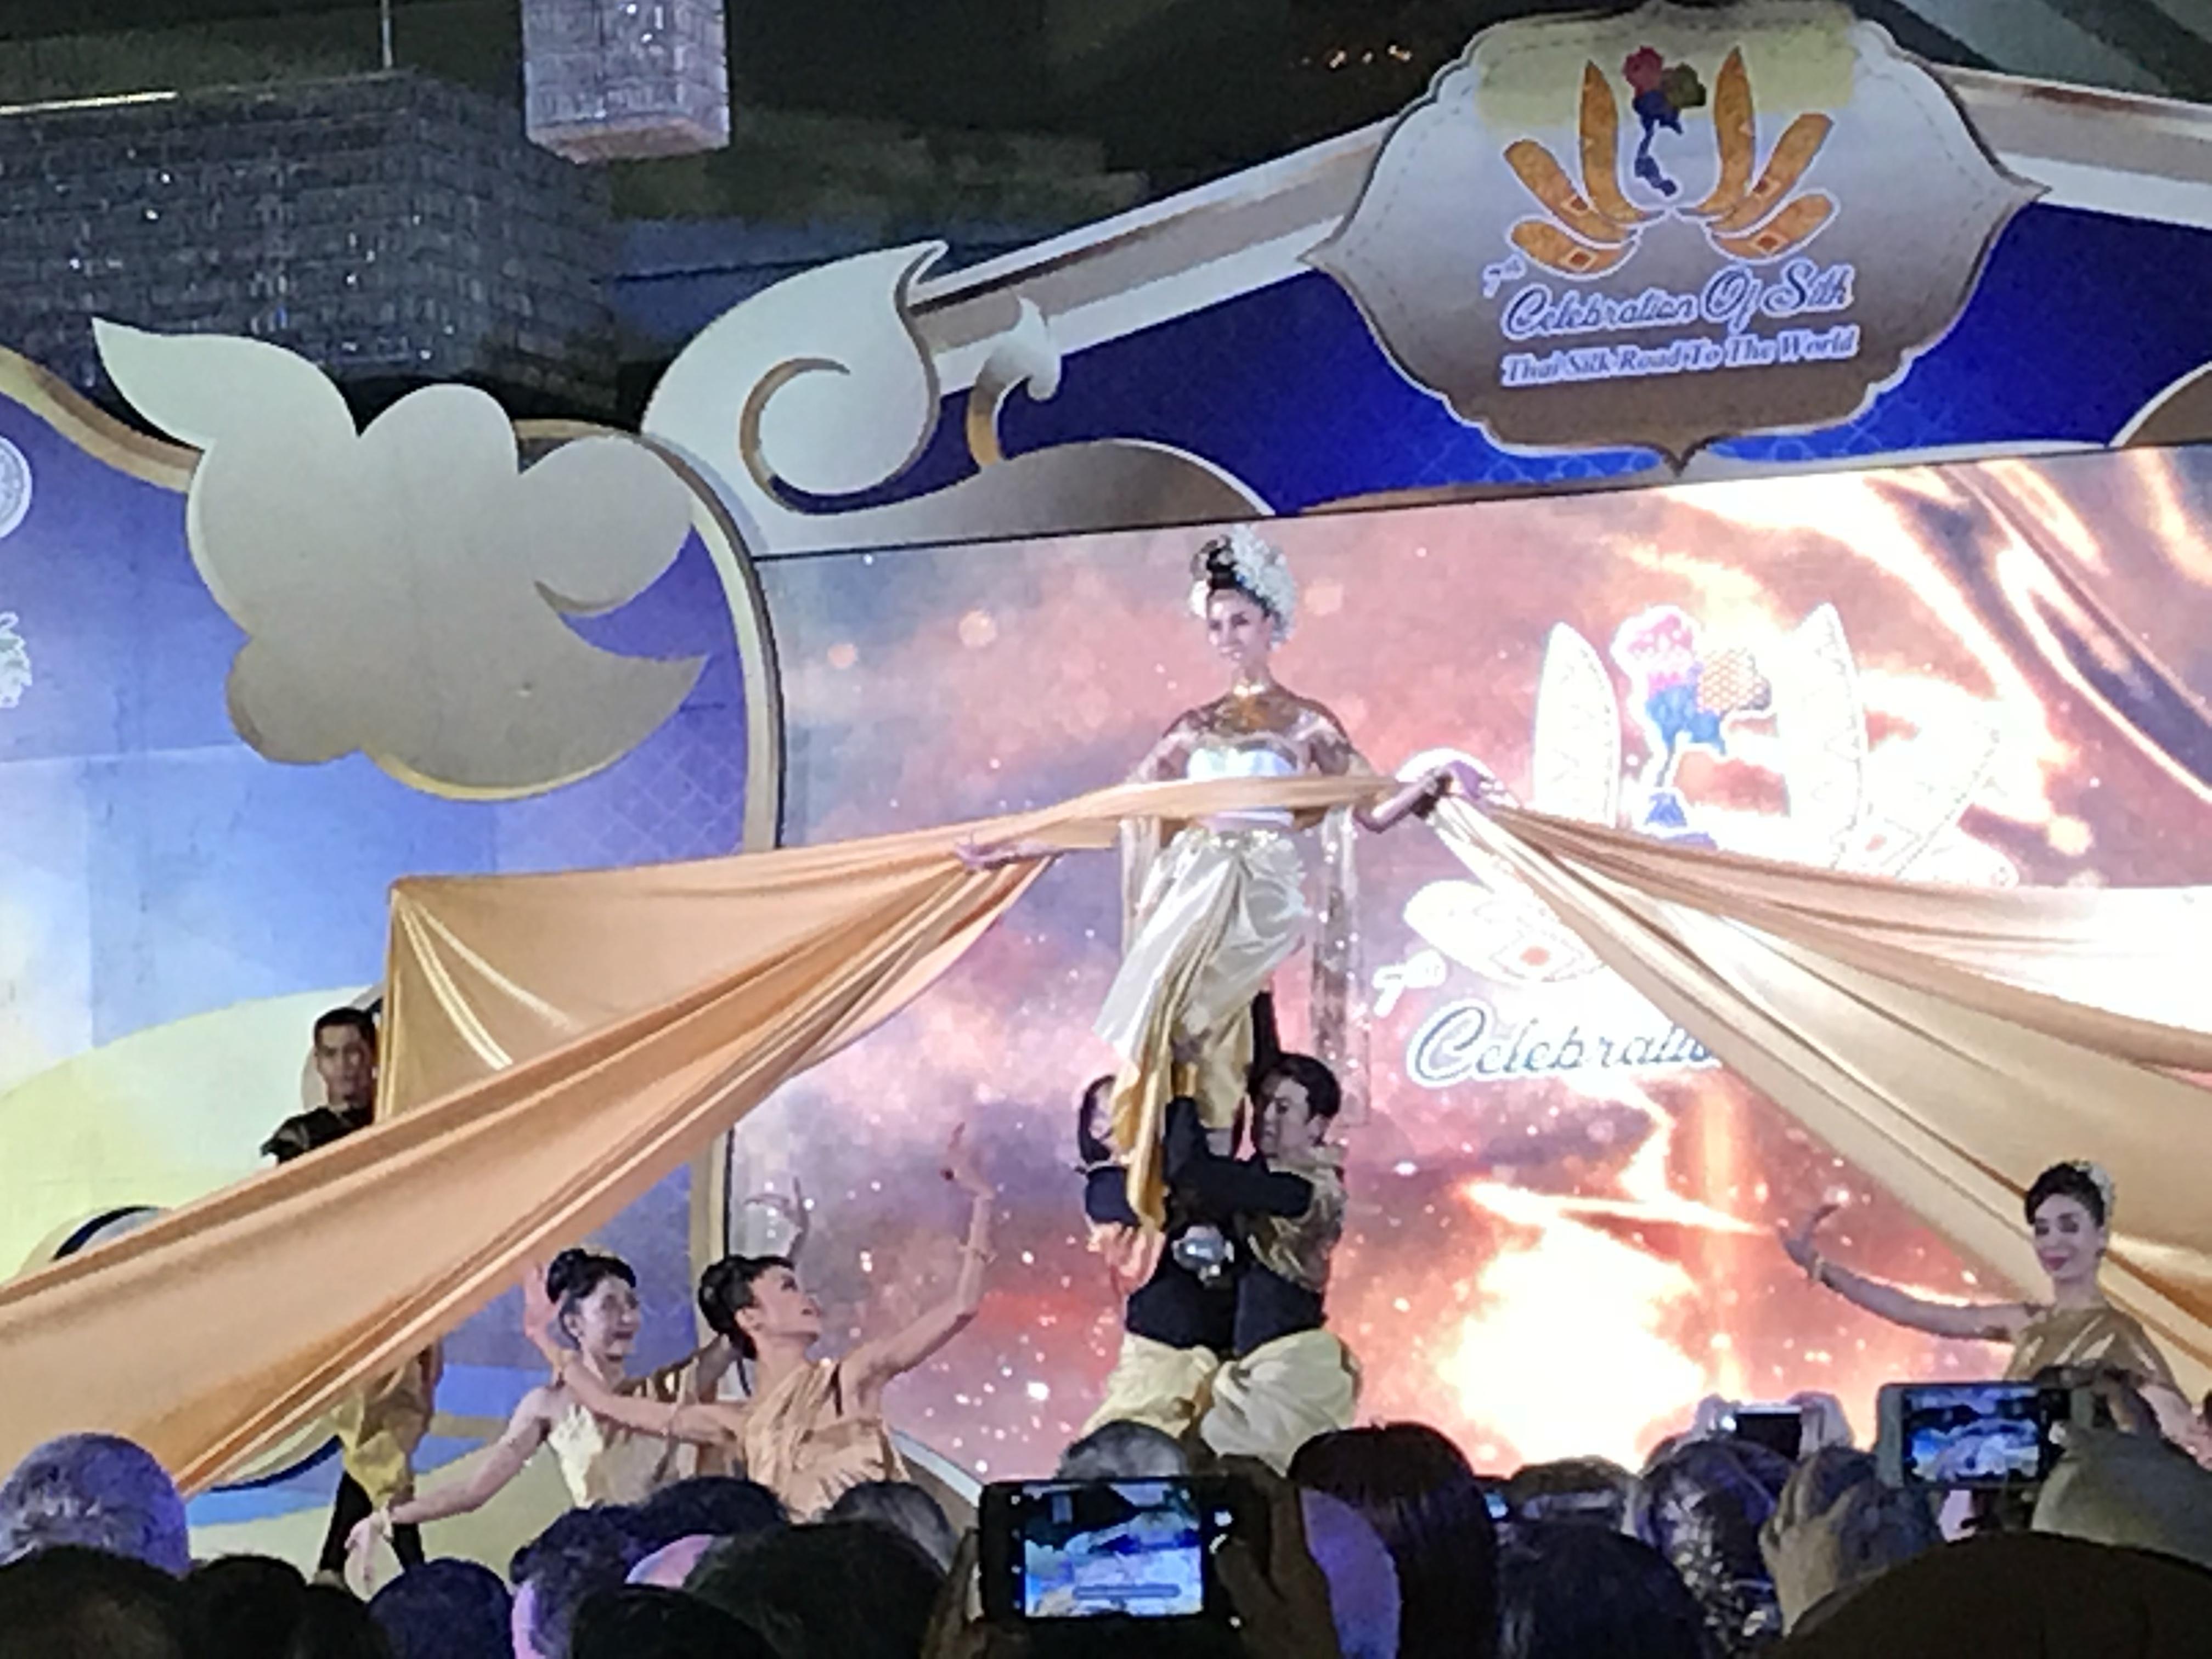 7th Celebration of Silk, fashion show&reception partyへ!